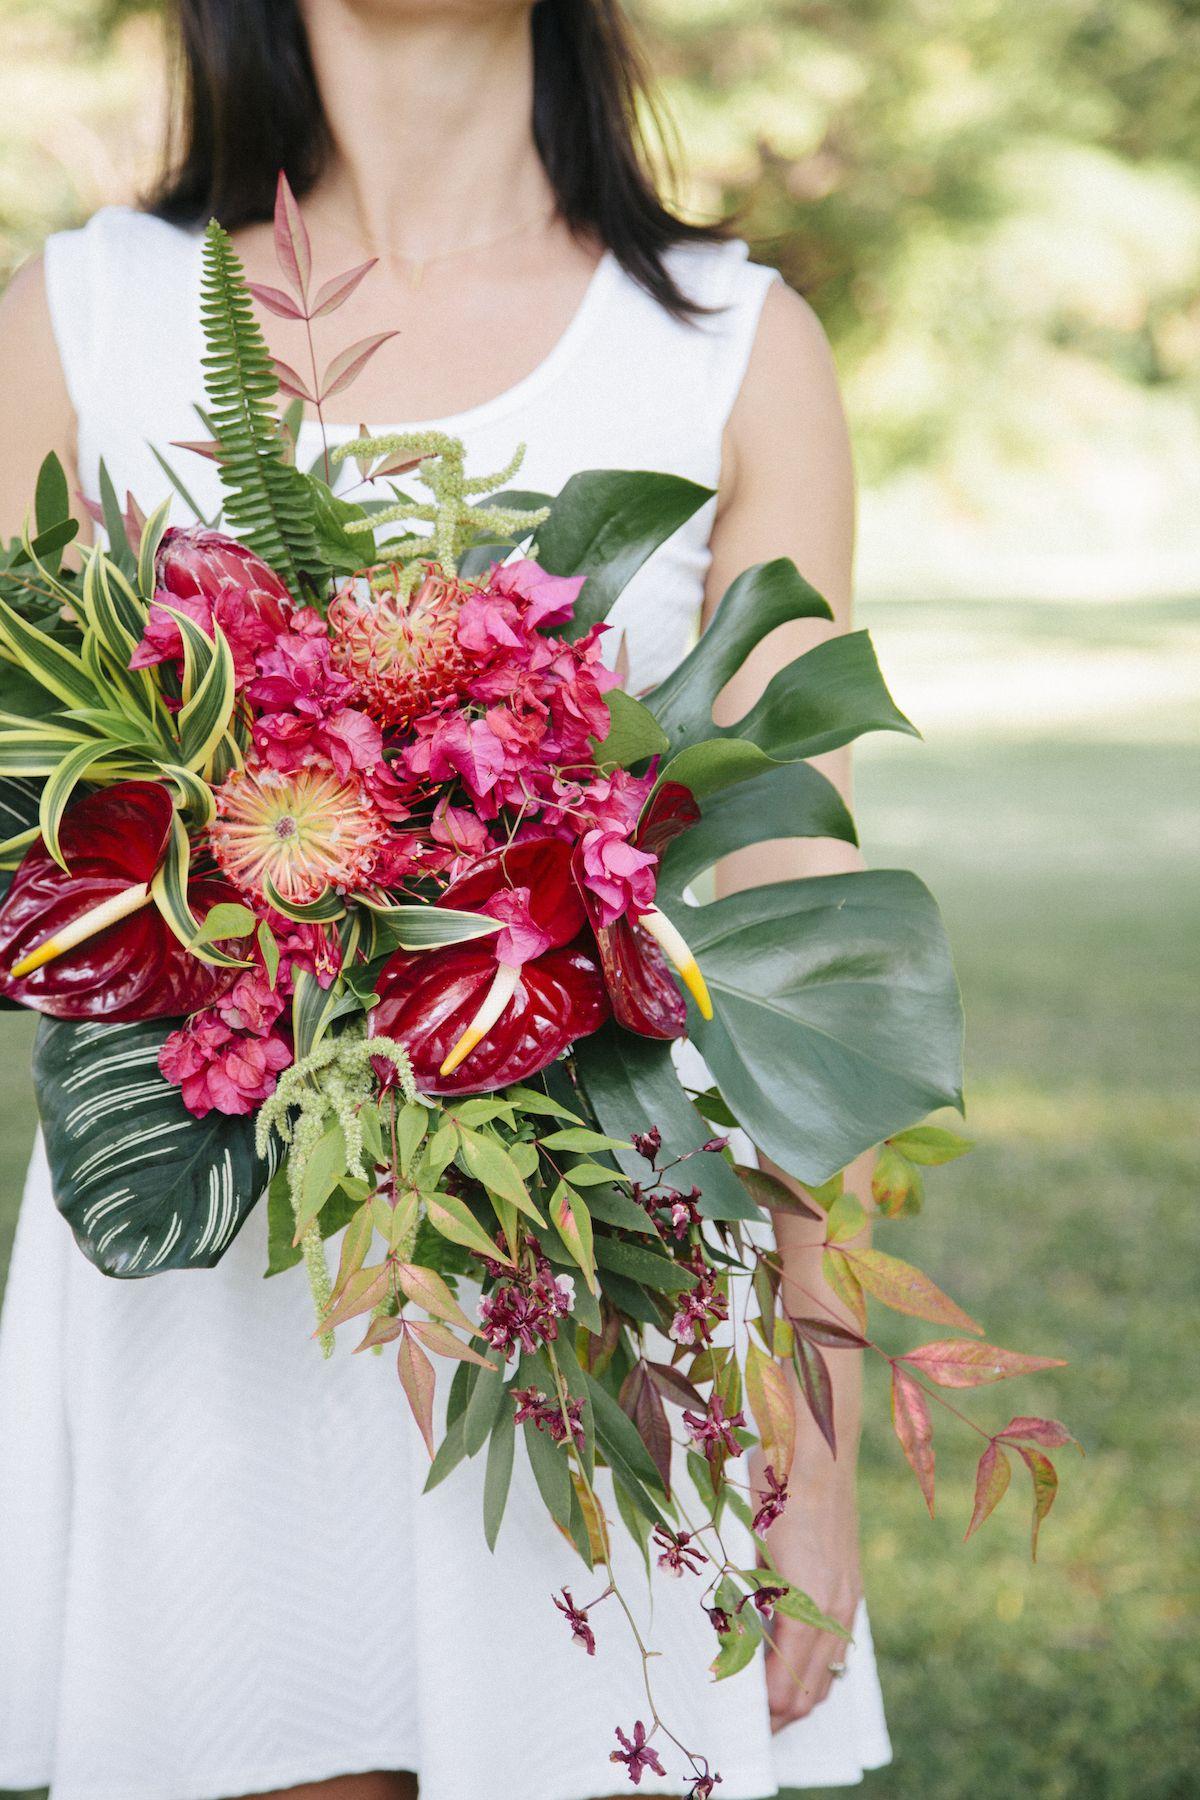 Wild and tropical hawaiian bouquet by okika httpokikafloral wild and tropical hawaiian bouquet by okika httpokikafloral izmirmasajfo Gallery